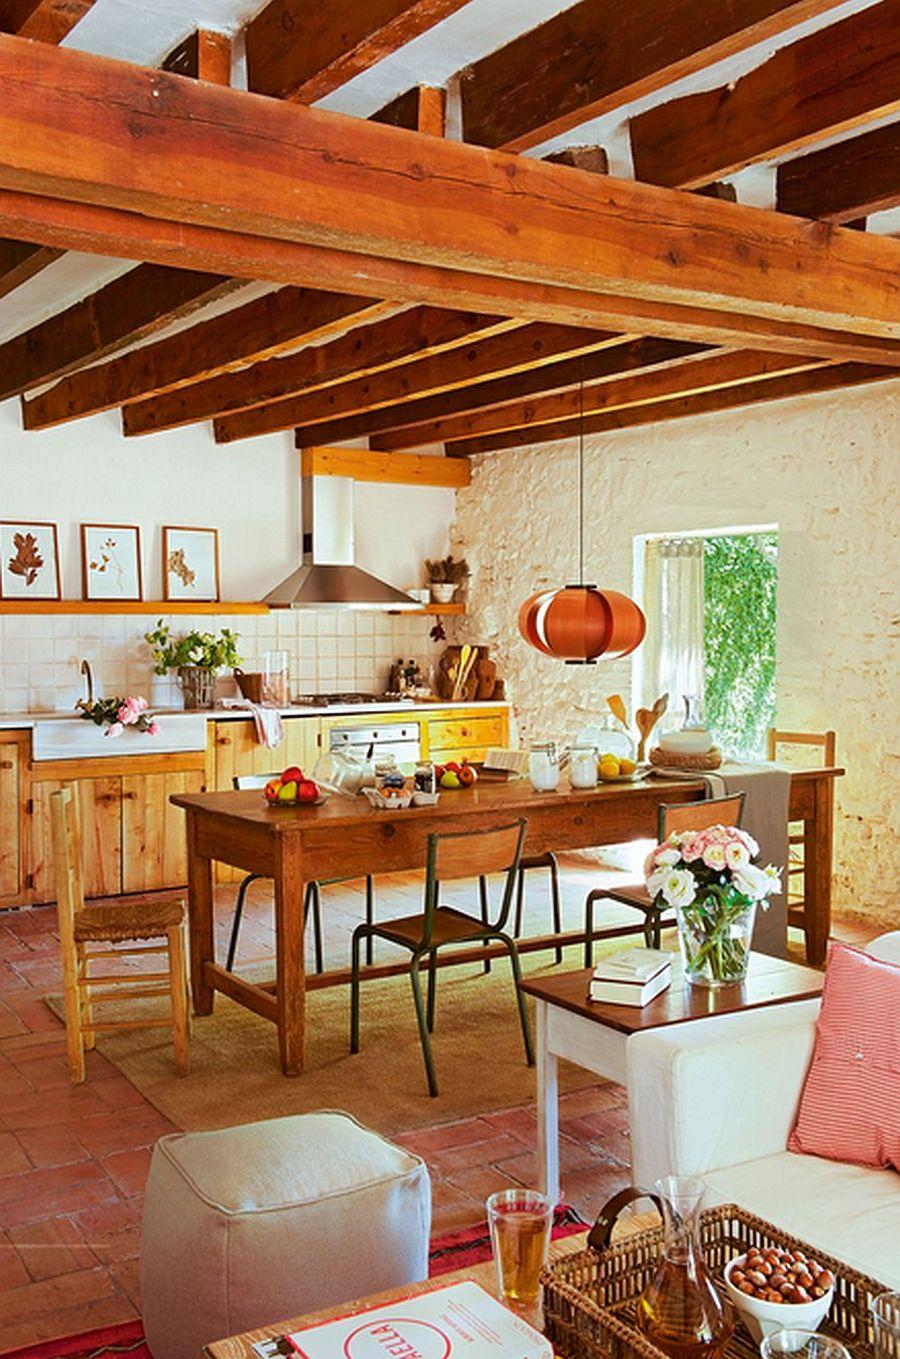 adelaparvu.com hambar transformat intr-o casa rustica, buacatrie si sufragerie rustica, arhitect Lluis Auquer, Foto ElMueble (7)